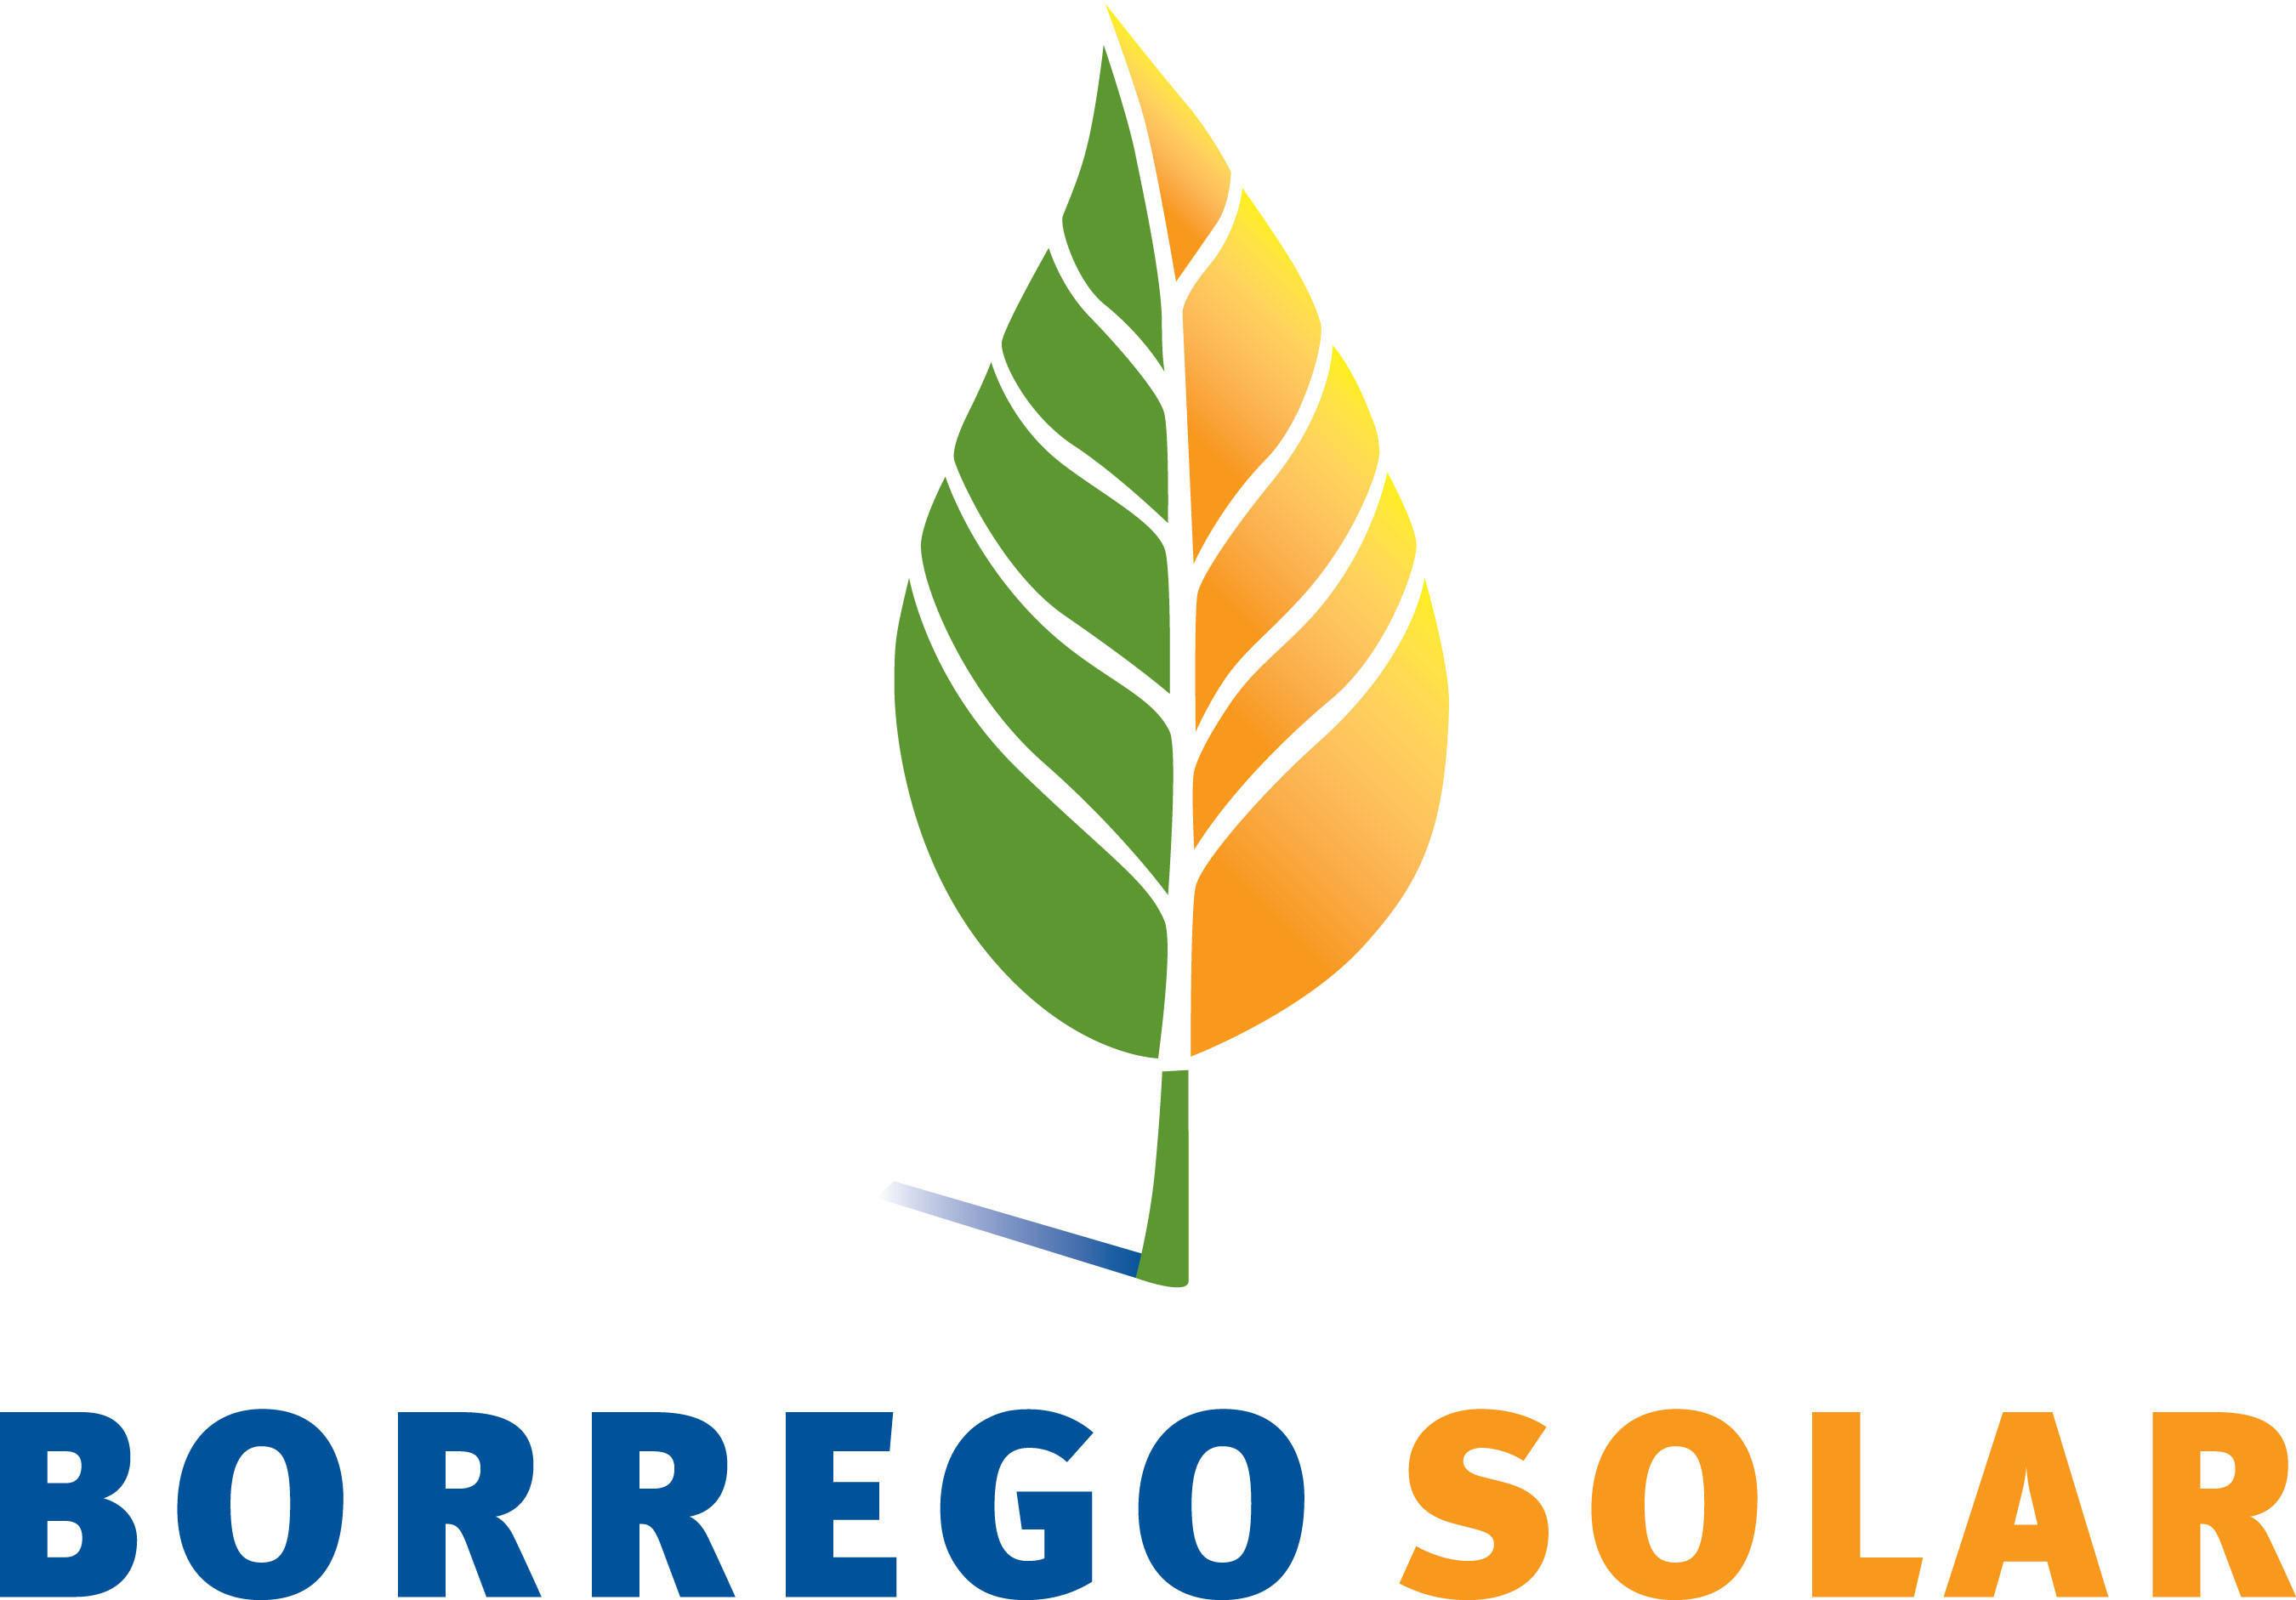 Borrego Solar Systems' logo.